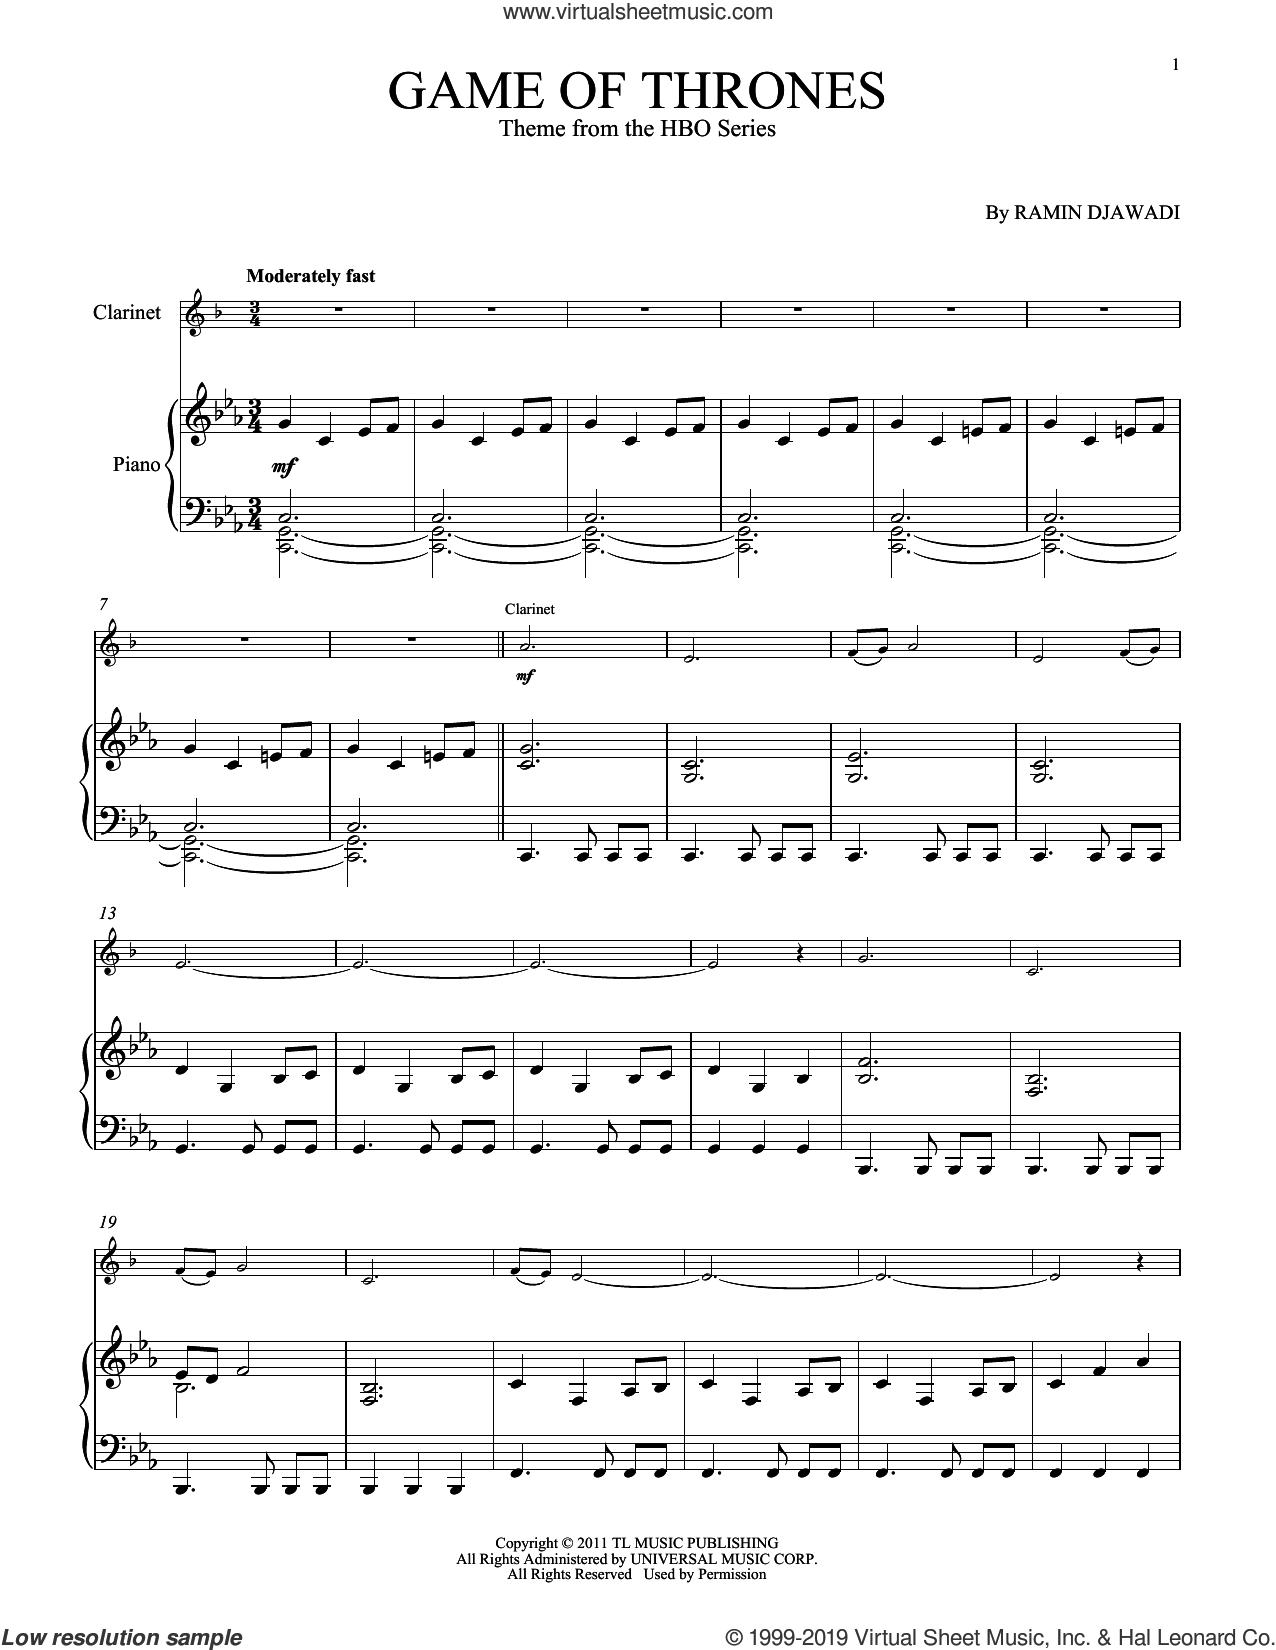 Game Of Thrones sheet music for clarinet and piano by Ramin Djawadi, intermediate skill level